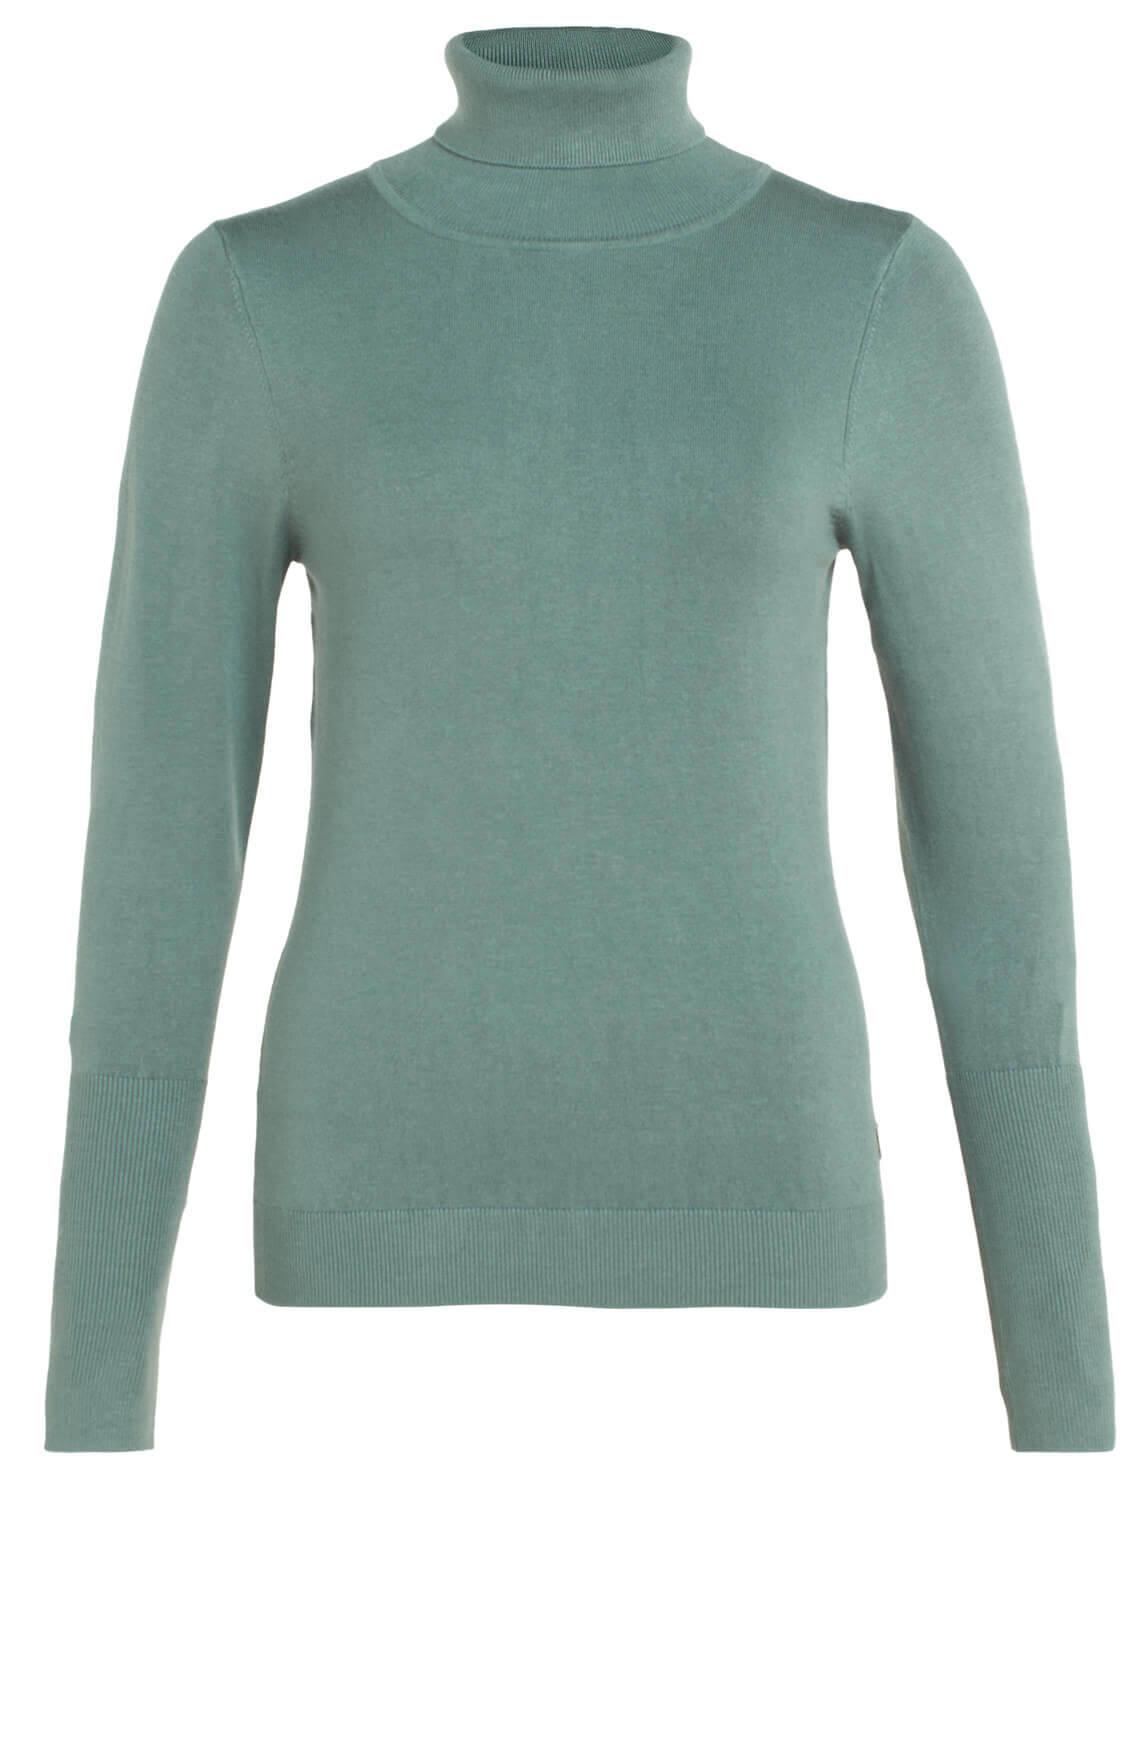 Anna Dames Pullover met col groen